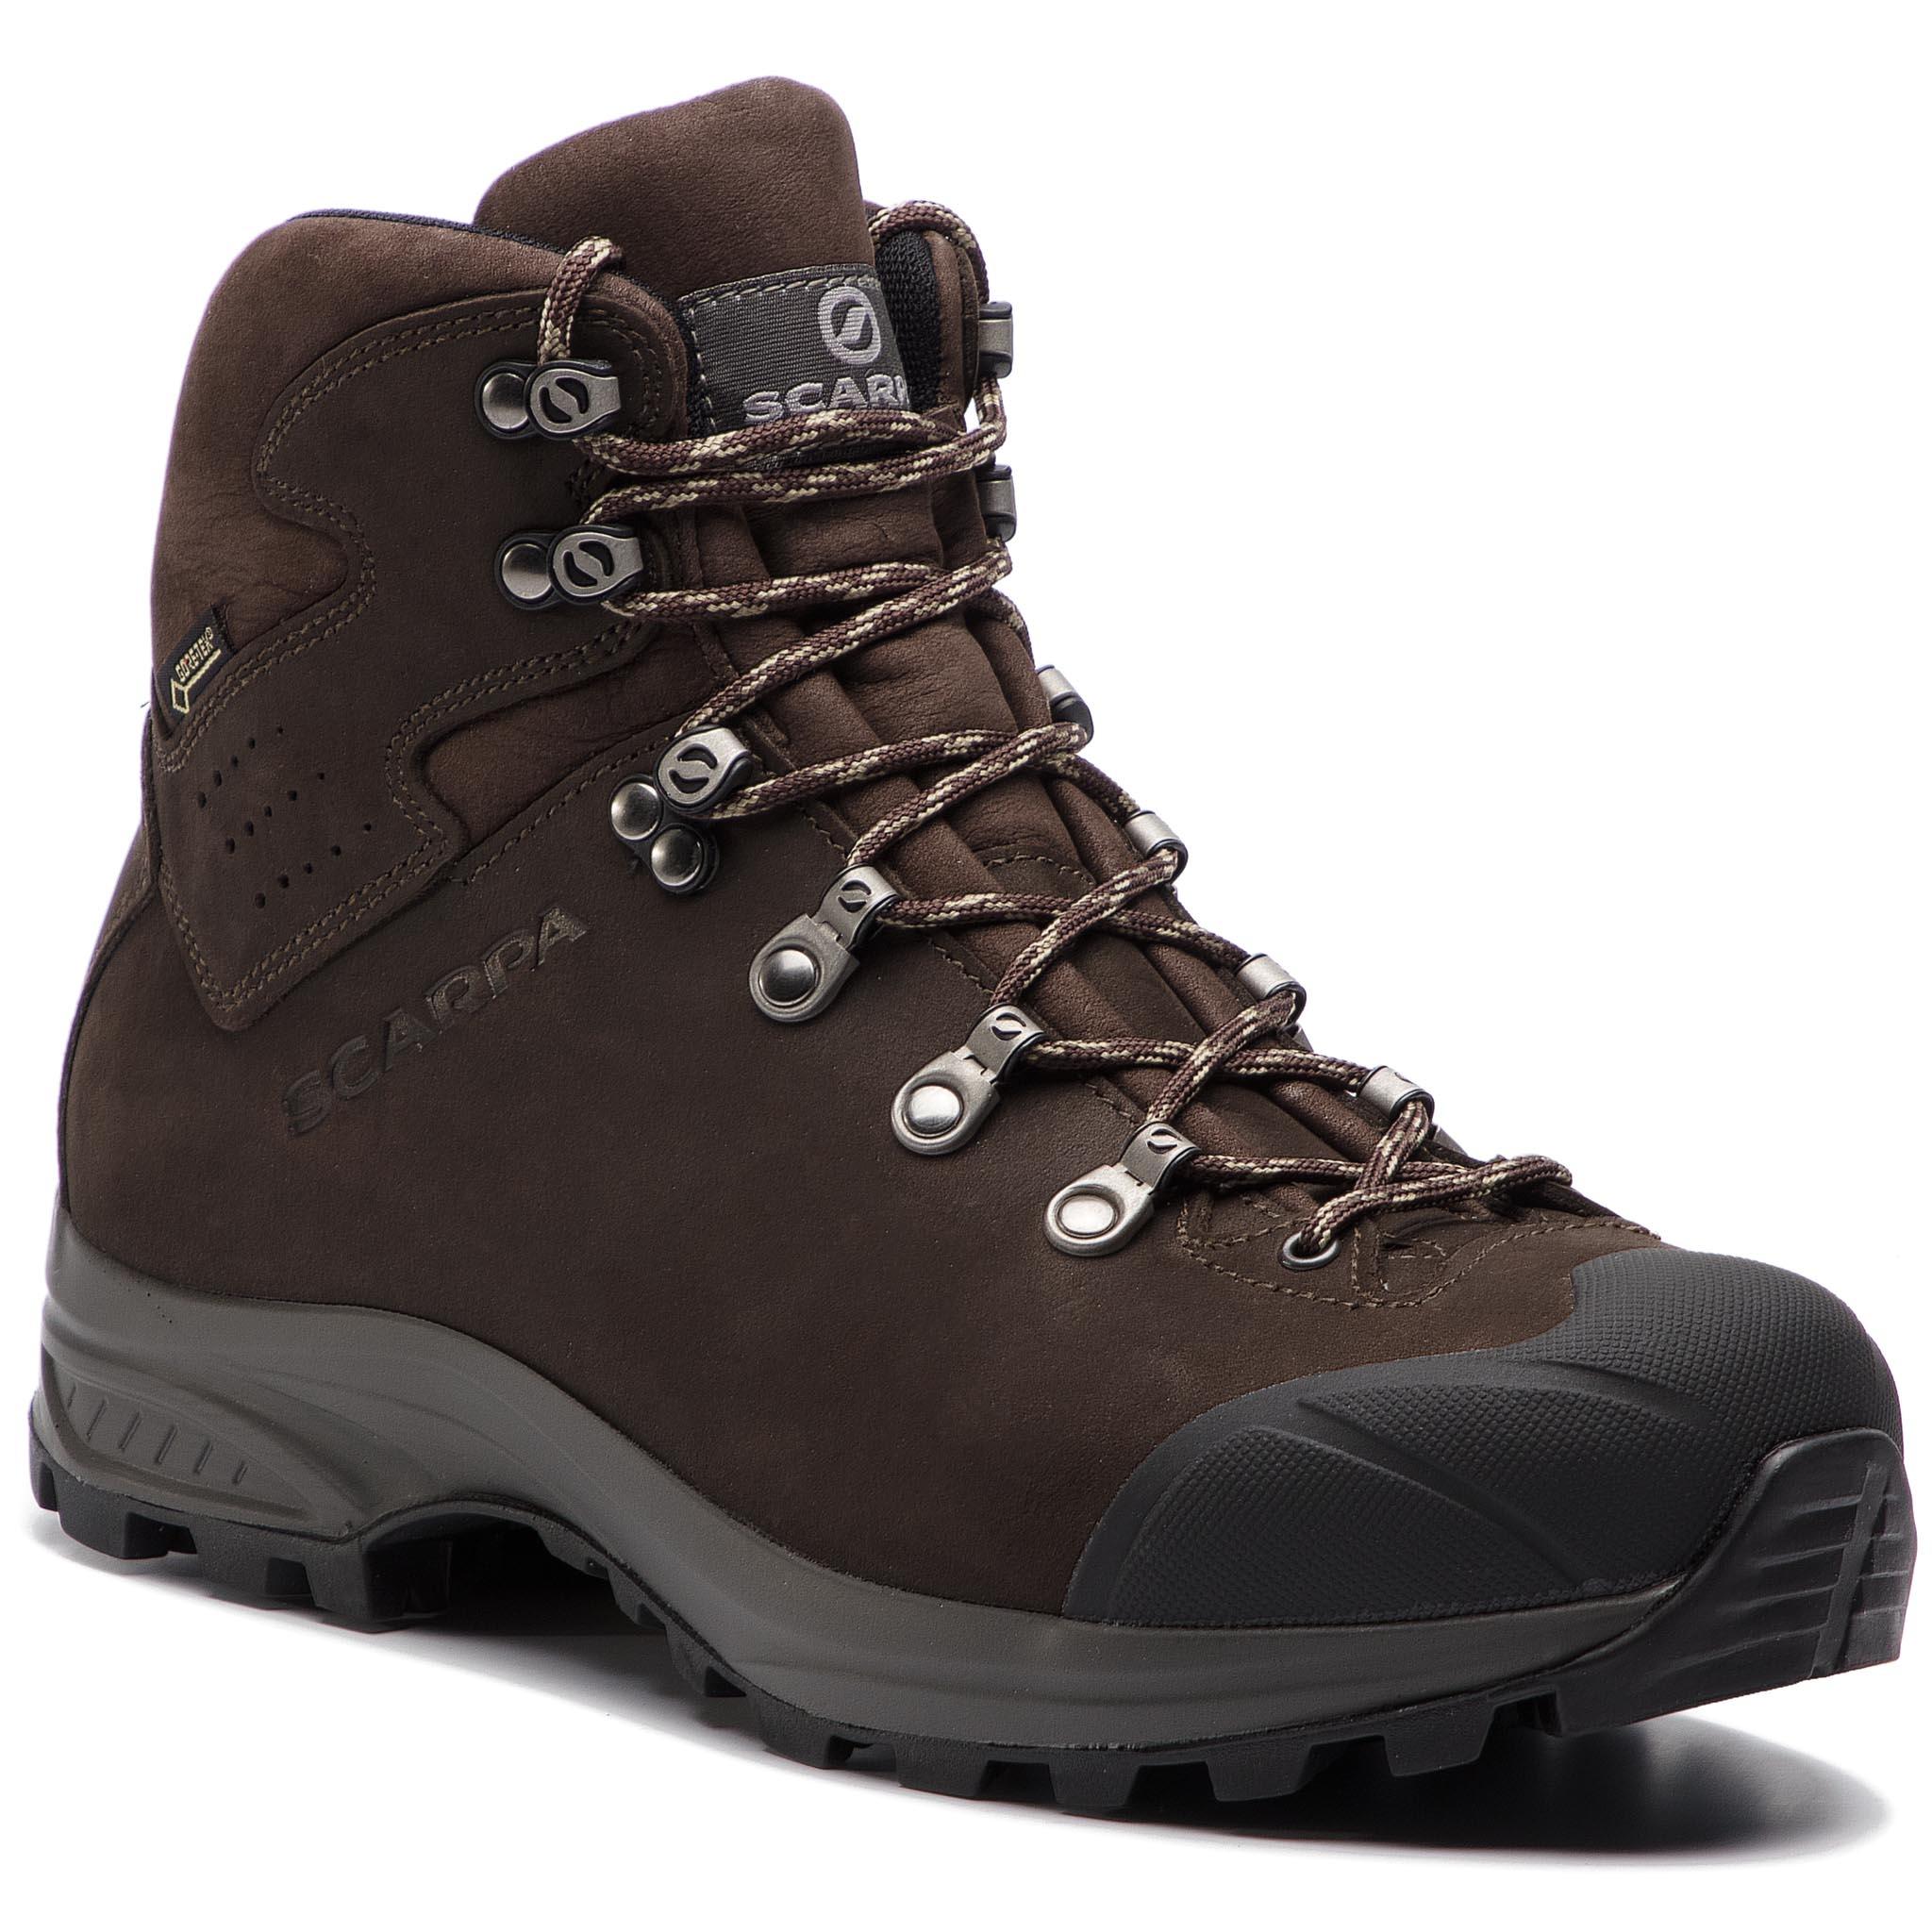 Trekingová obuv SCARPA - Kailash Plus Gtx GORE-TEX 61061-200 Dark Coffee